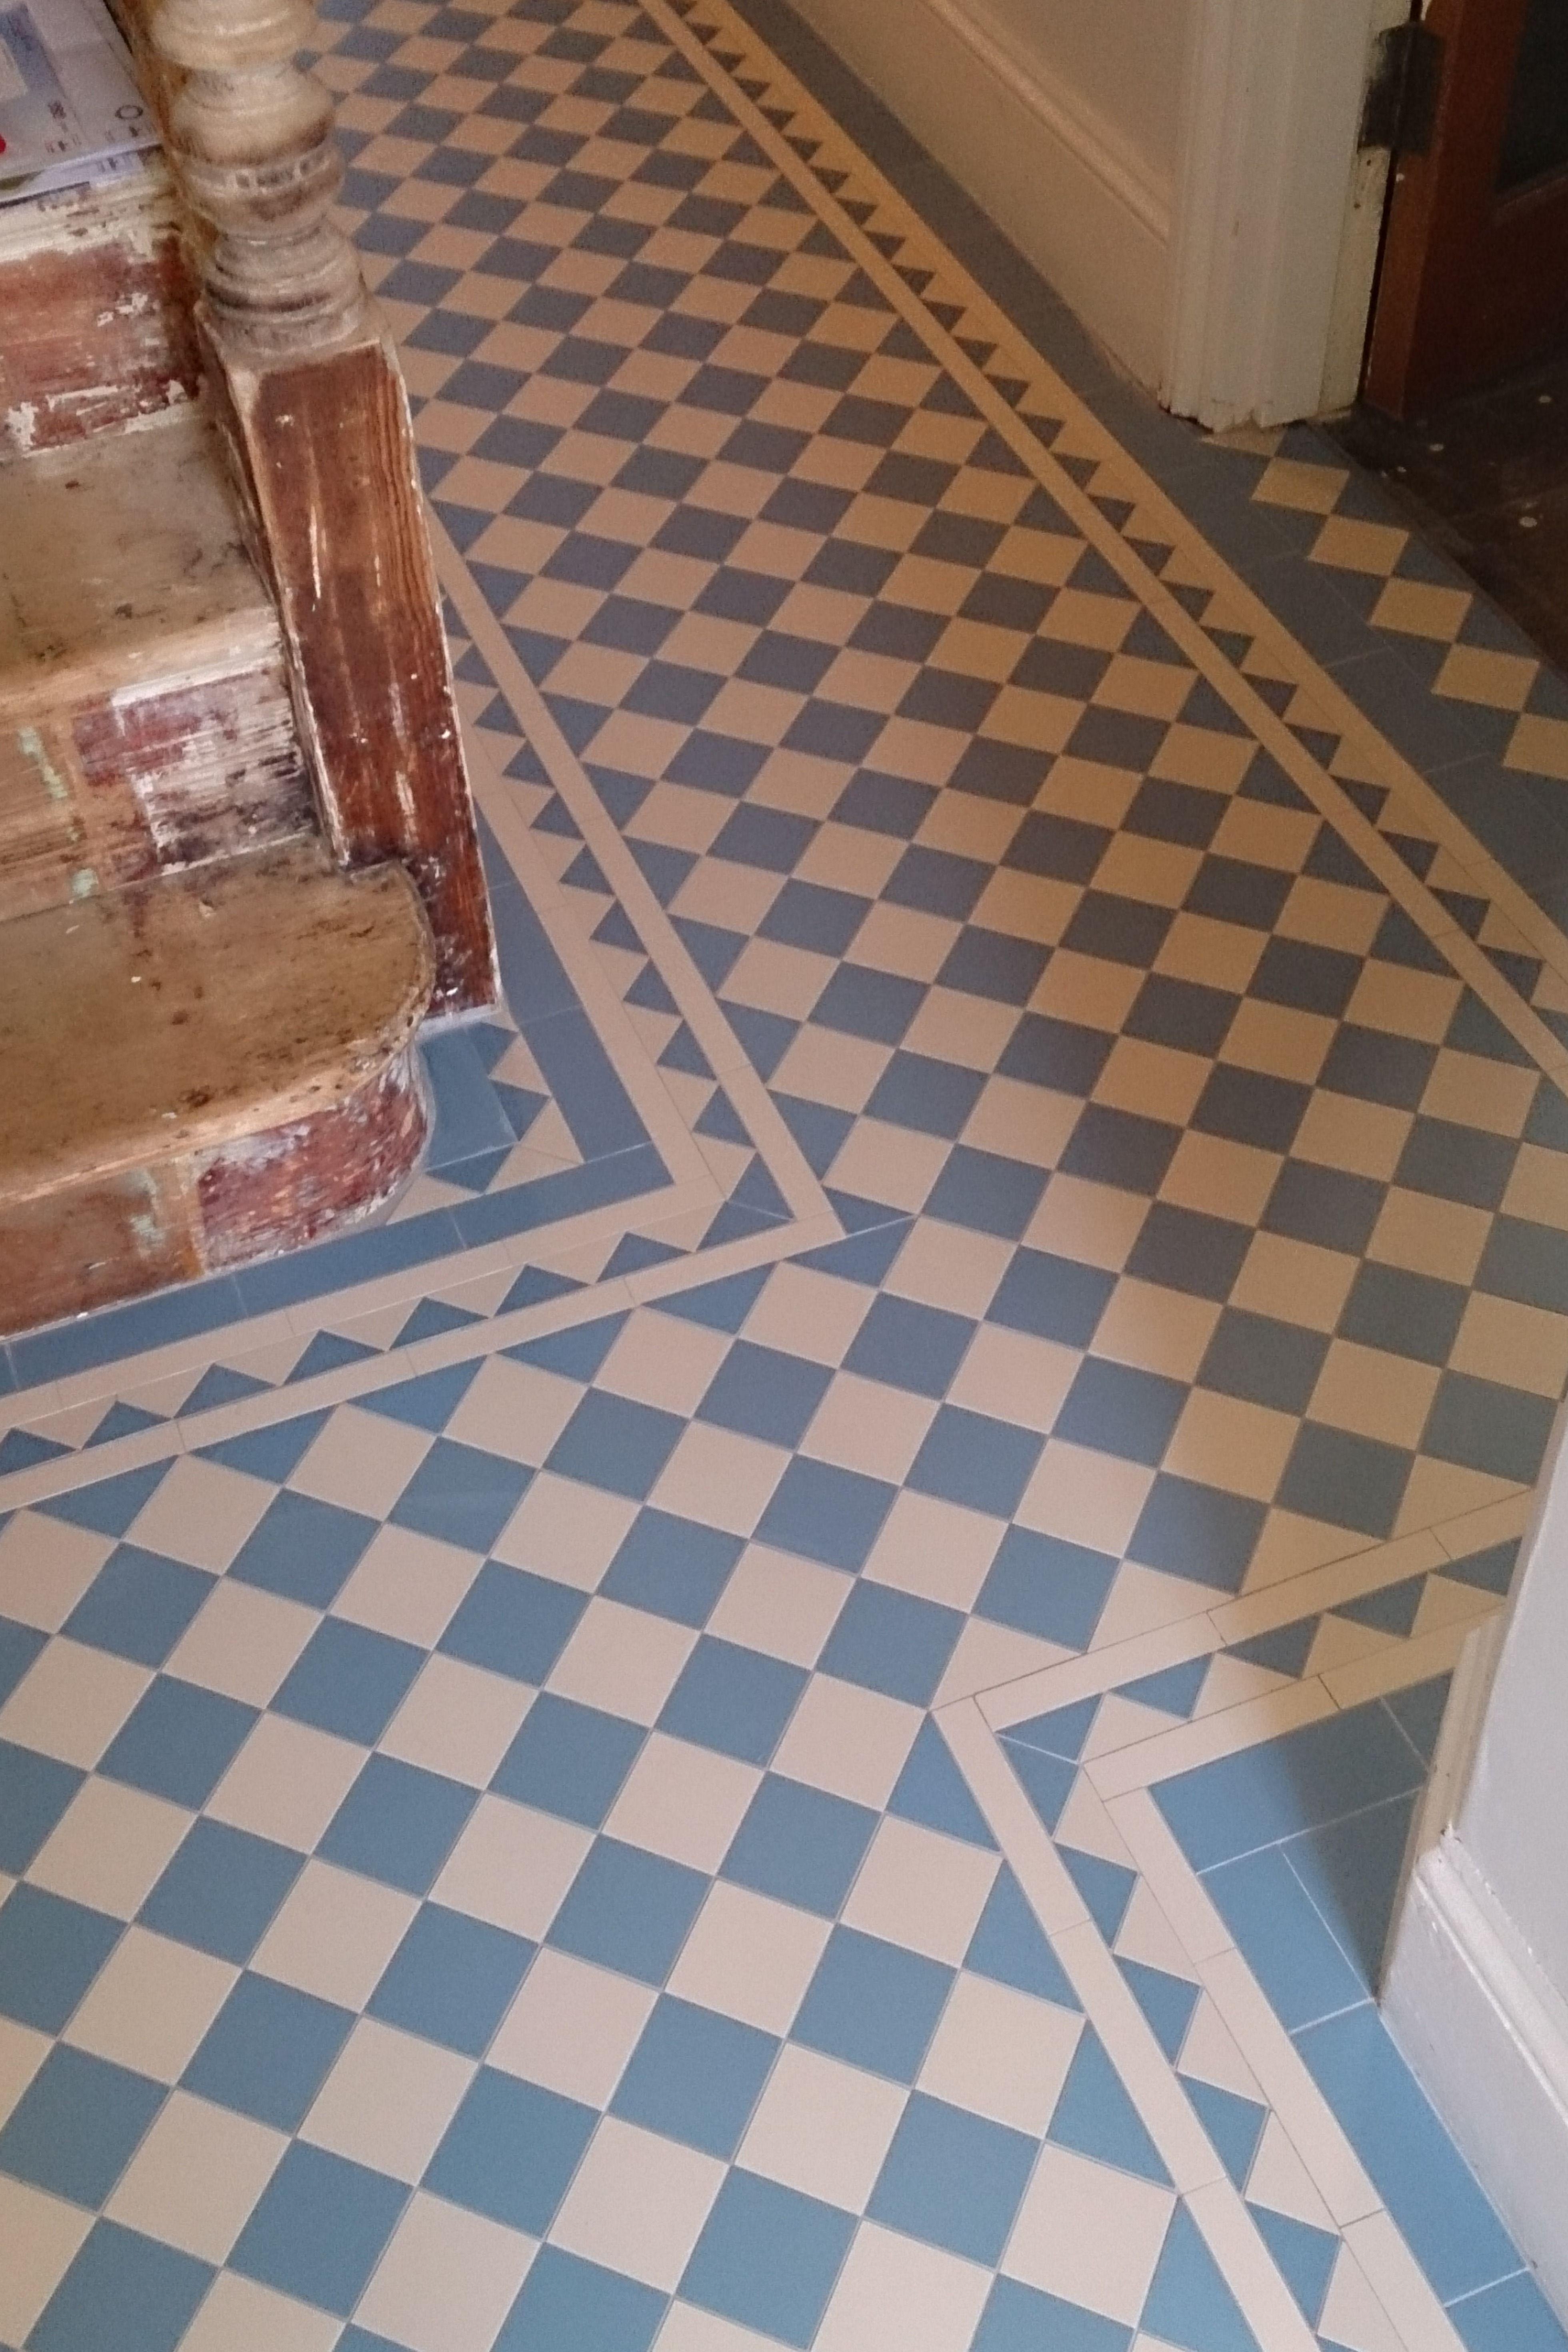 London Mosaic Victorian Tiles Sheeted Tile Designs Londonmosaic Sheetedtiles Mosaic London Flooring Tile Design Interior Design Photography